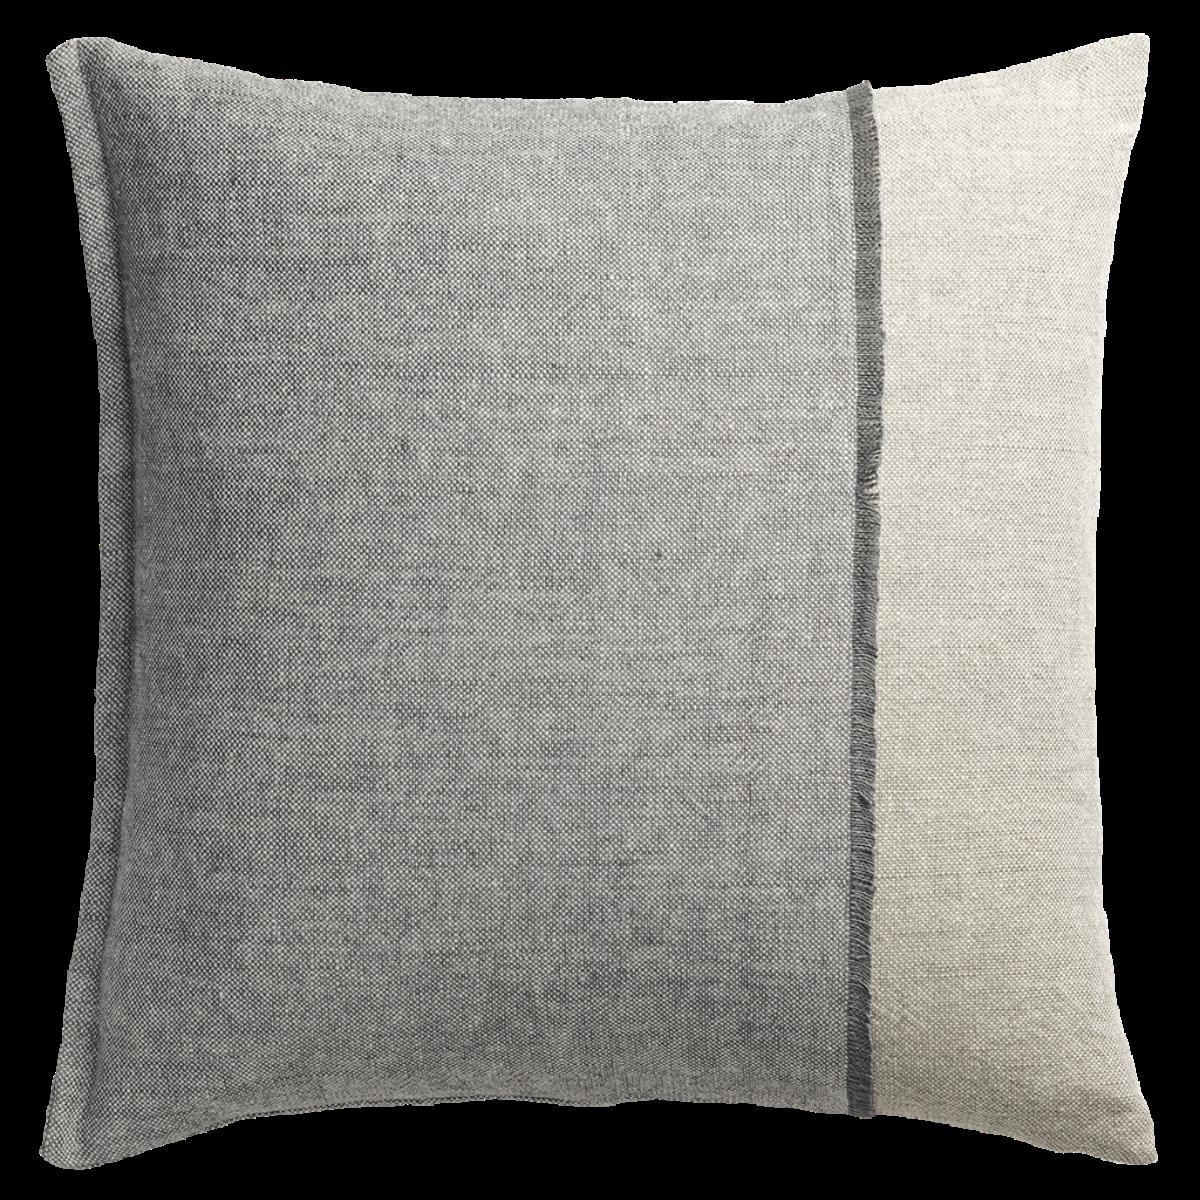 de Le Cuona | Haiku Panel Cushion With Fringe Detail Salt/Boulder